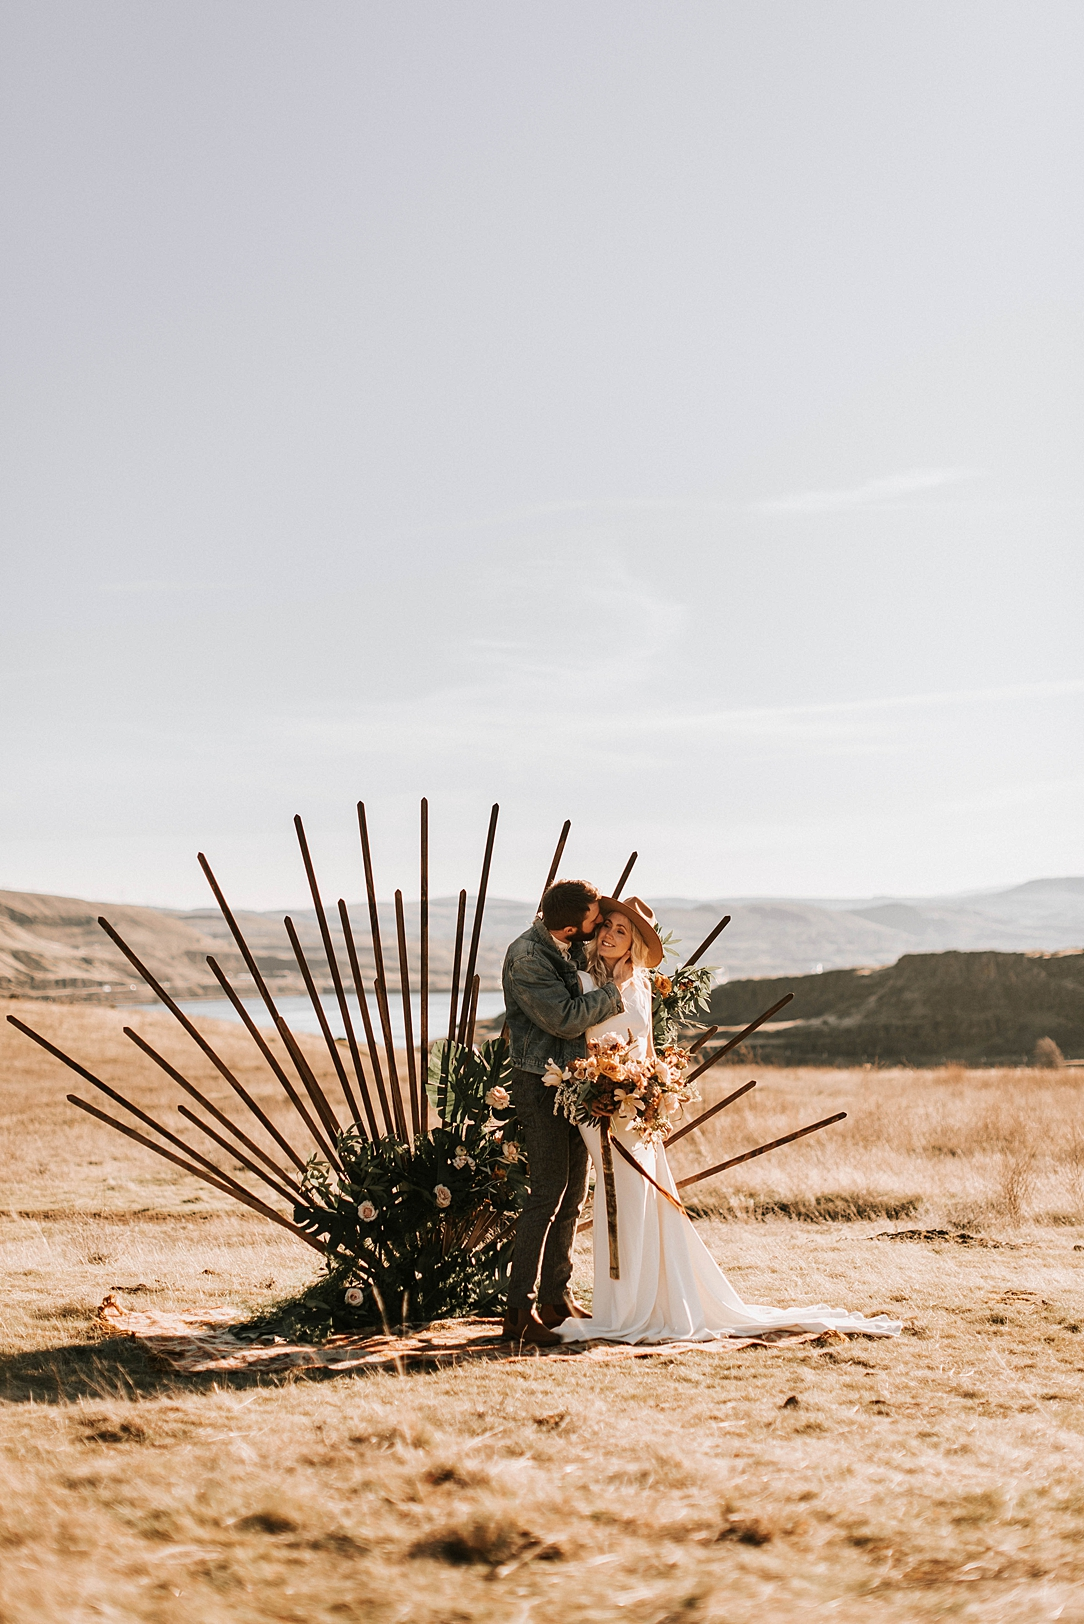 nbp-desert-elopement_0028.jpg